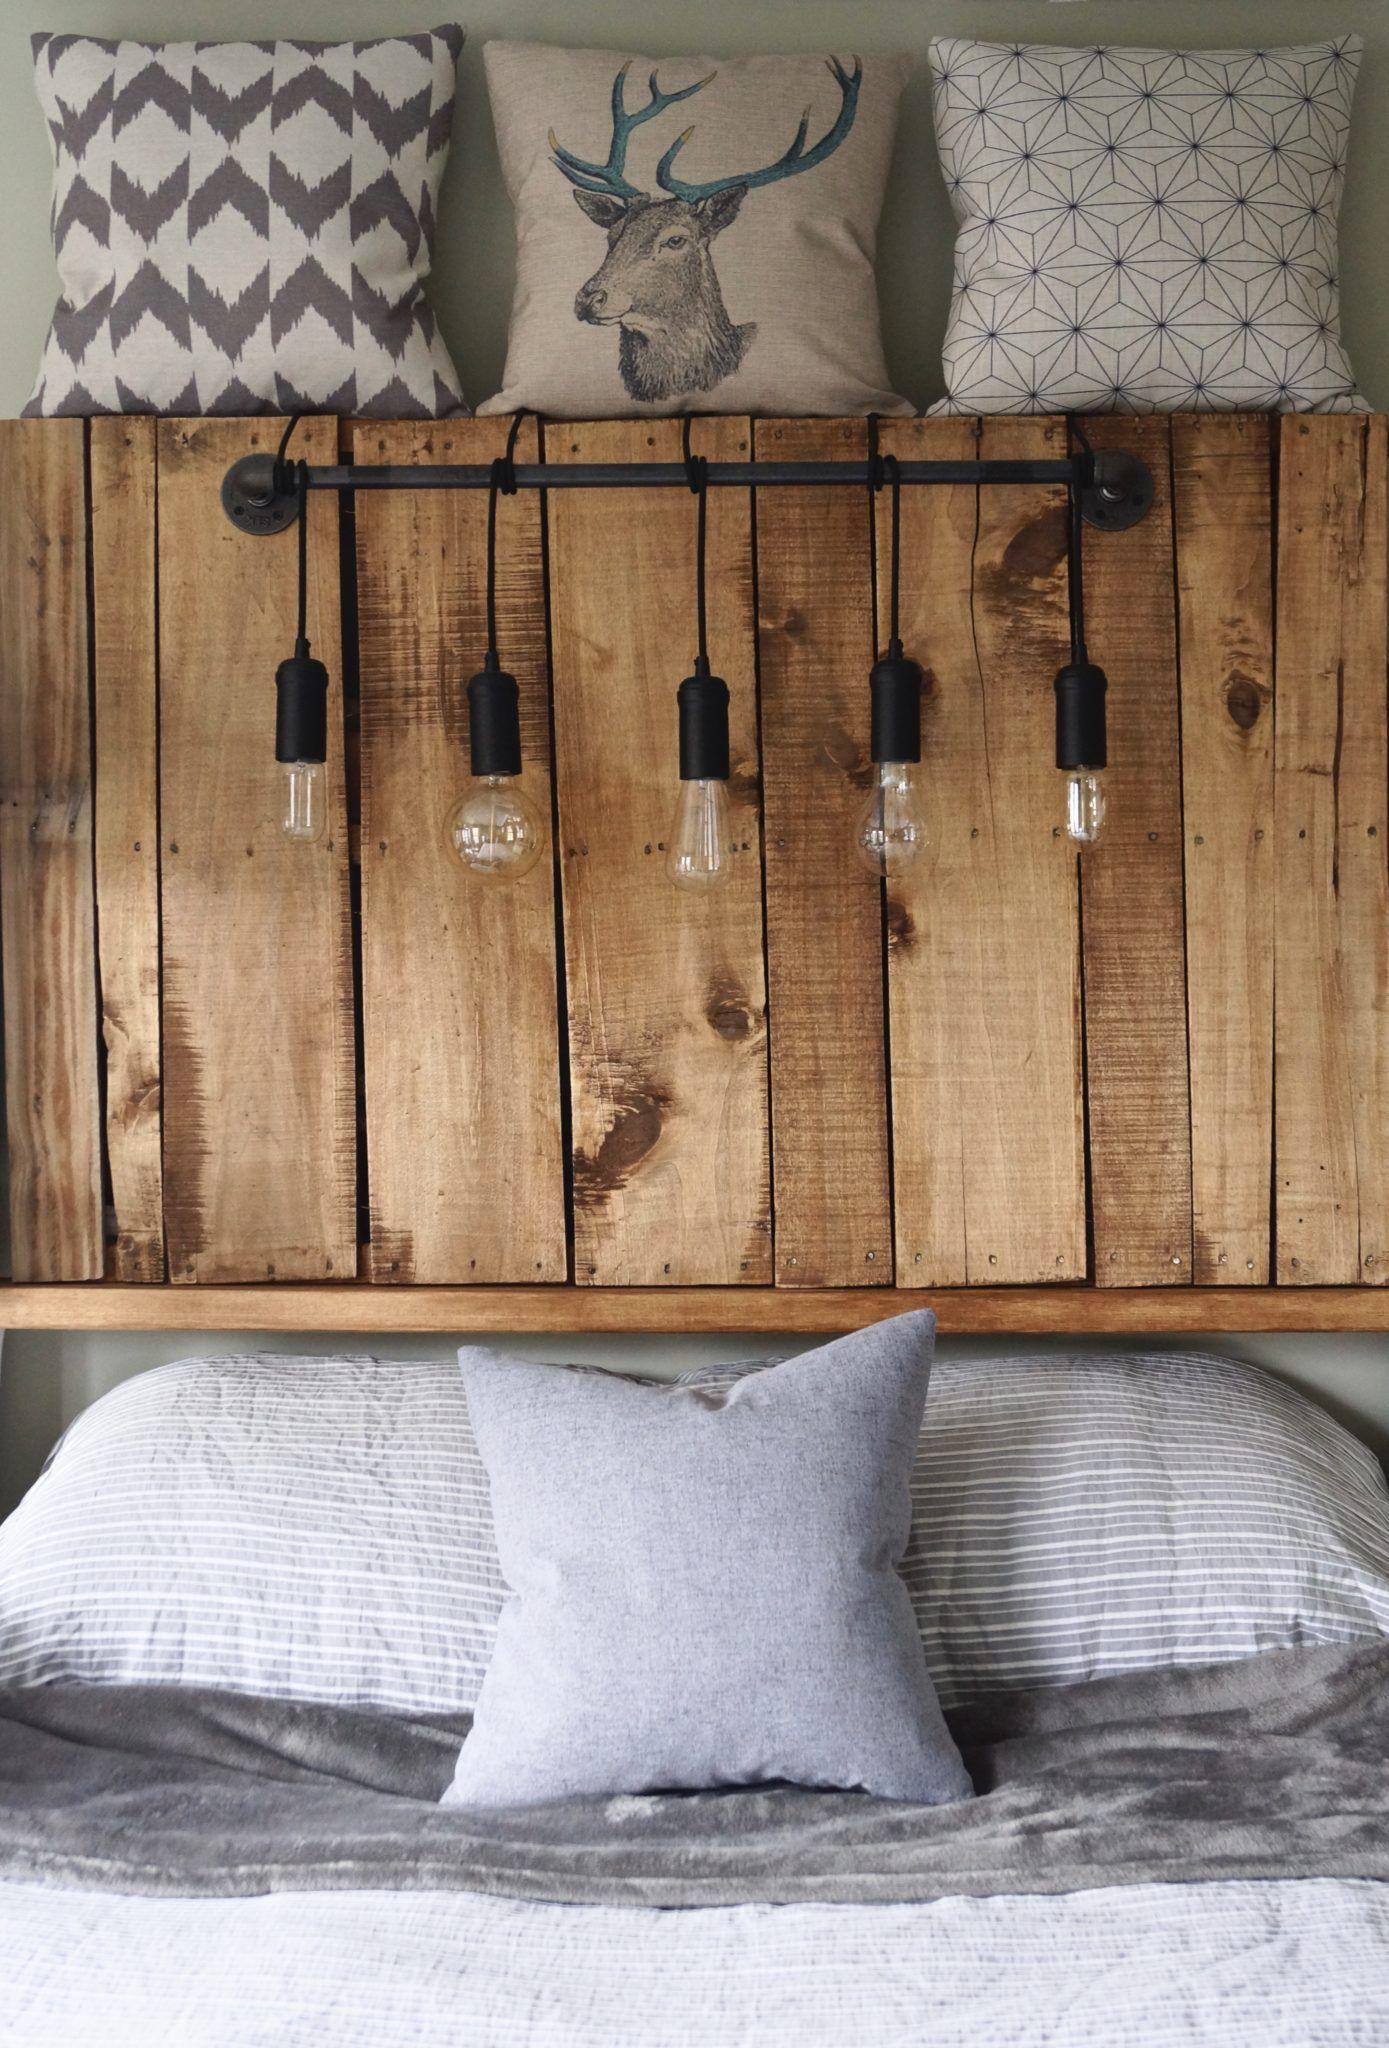 kopfteil f r bett aus europaletten selber bauen diy anleitung diy m bel apartment ideas. Black Bedroom Furniture Sets. Home Design Ideas